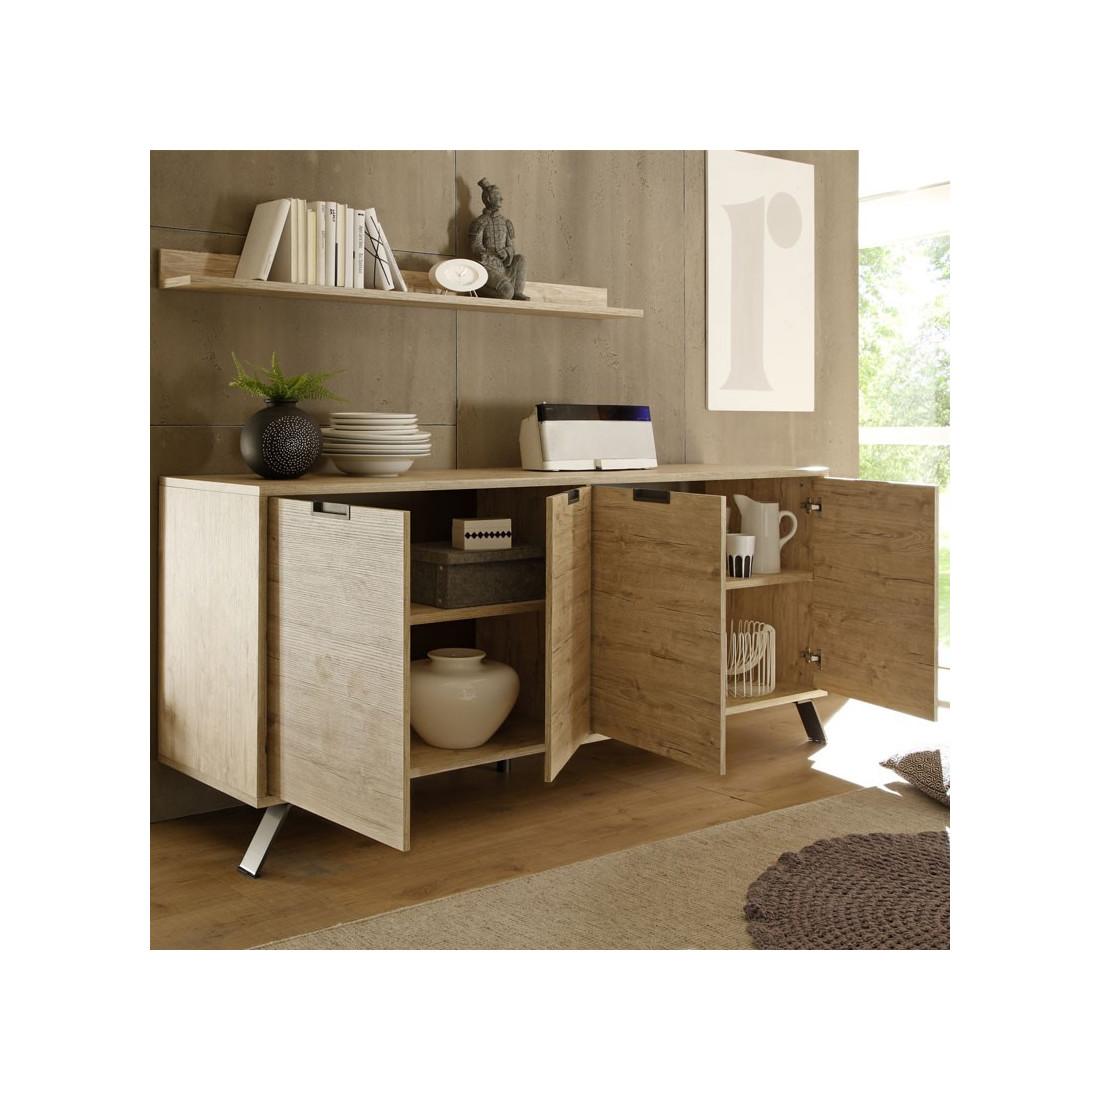 grand buffet 4 portes ch ne clair palerme univers salle. Black Bedroom Furniture Sets. Home Design Ideas